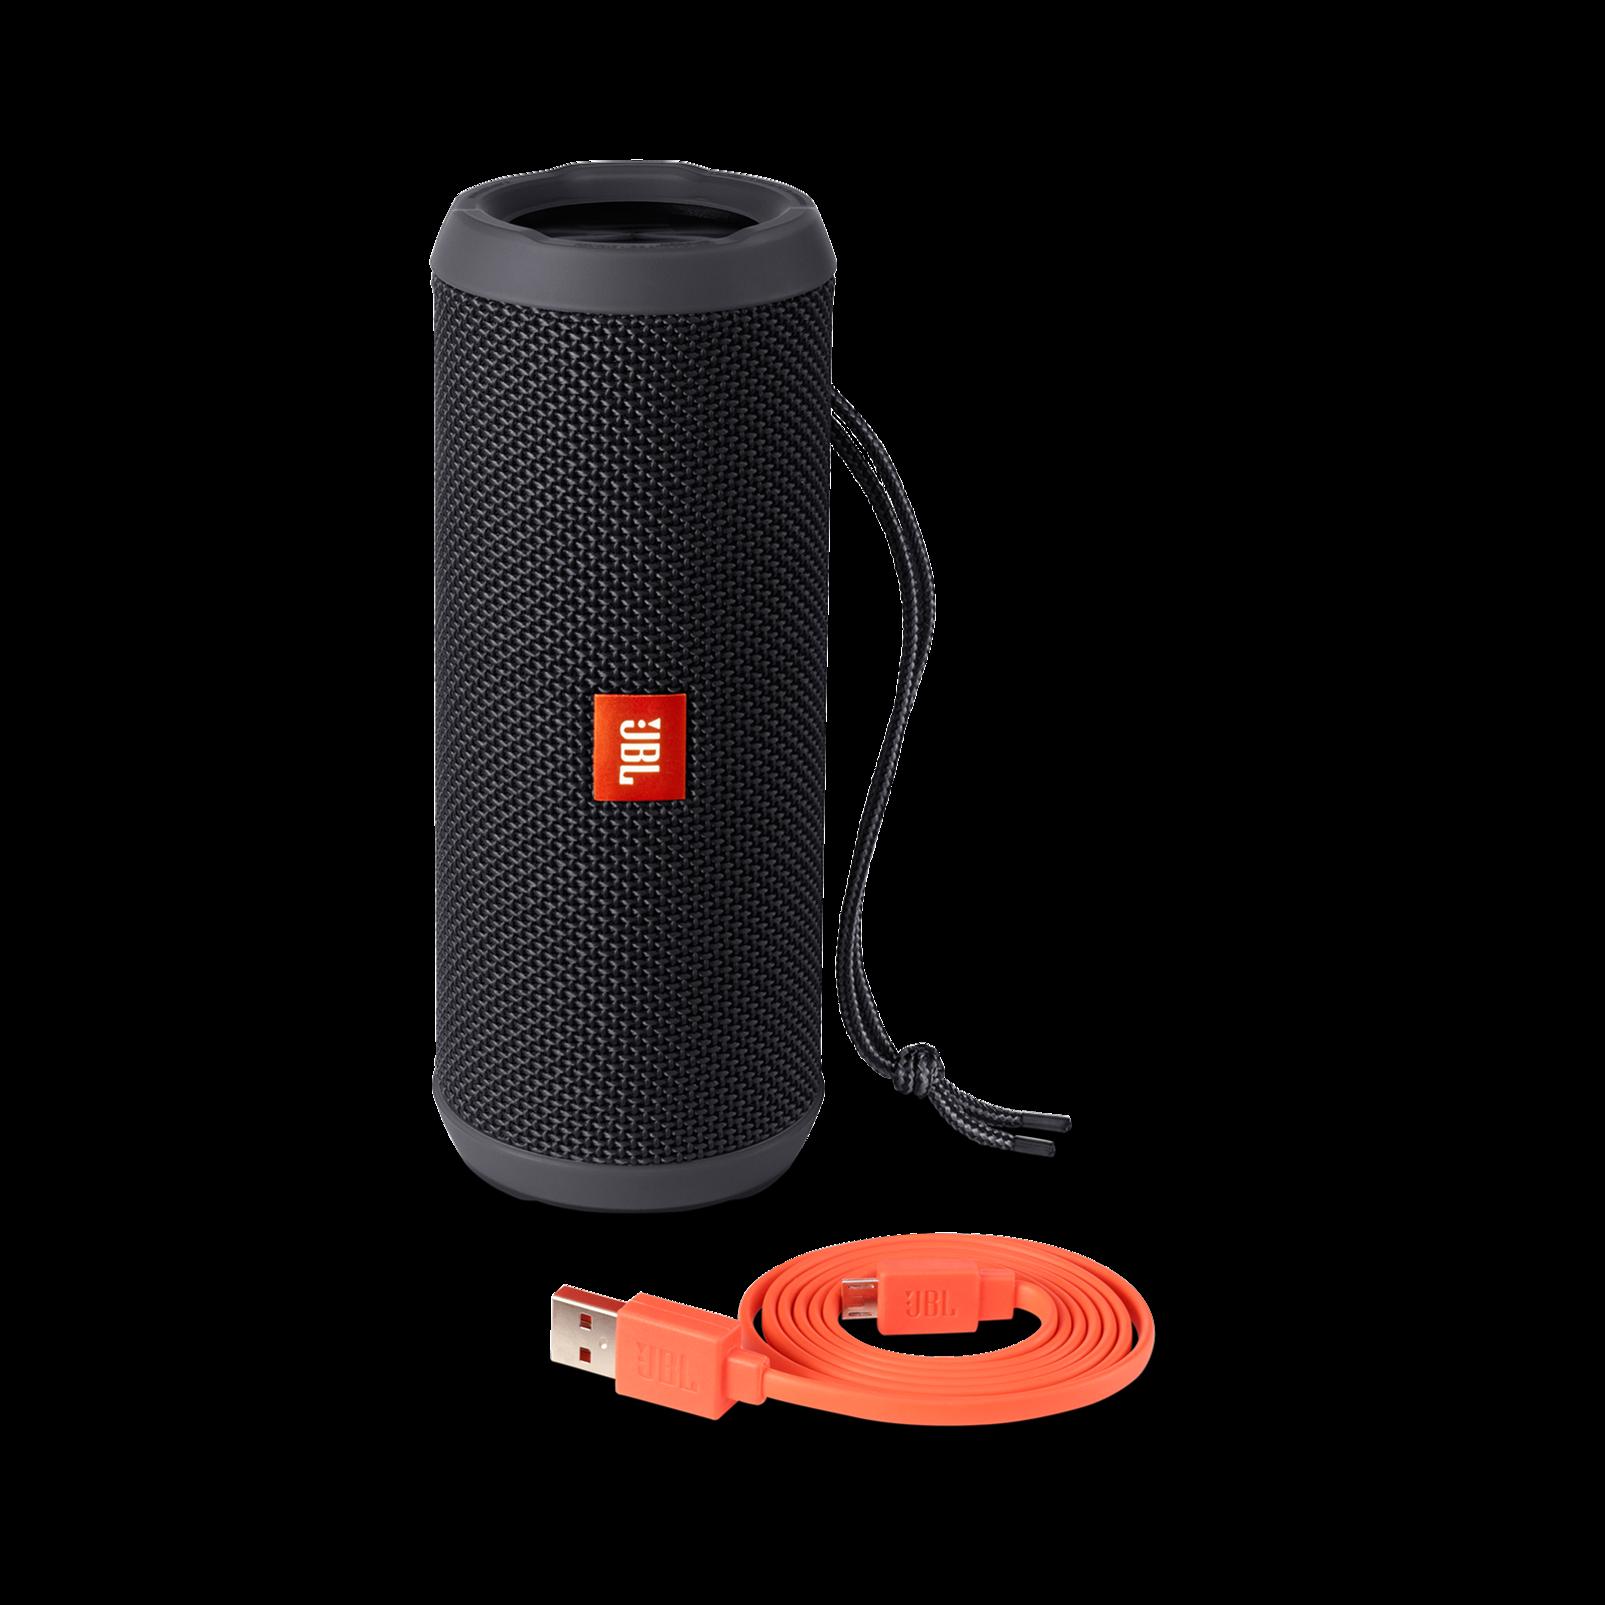 jbl flip 3 splashproof bluetooth speaker with speakerphone. Black Bedroom Furniture Sets. Home Design Ideas